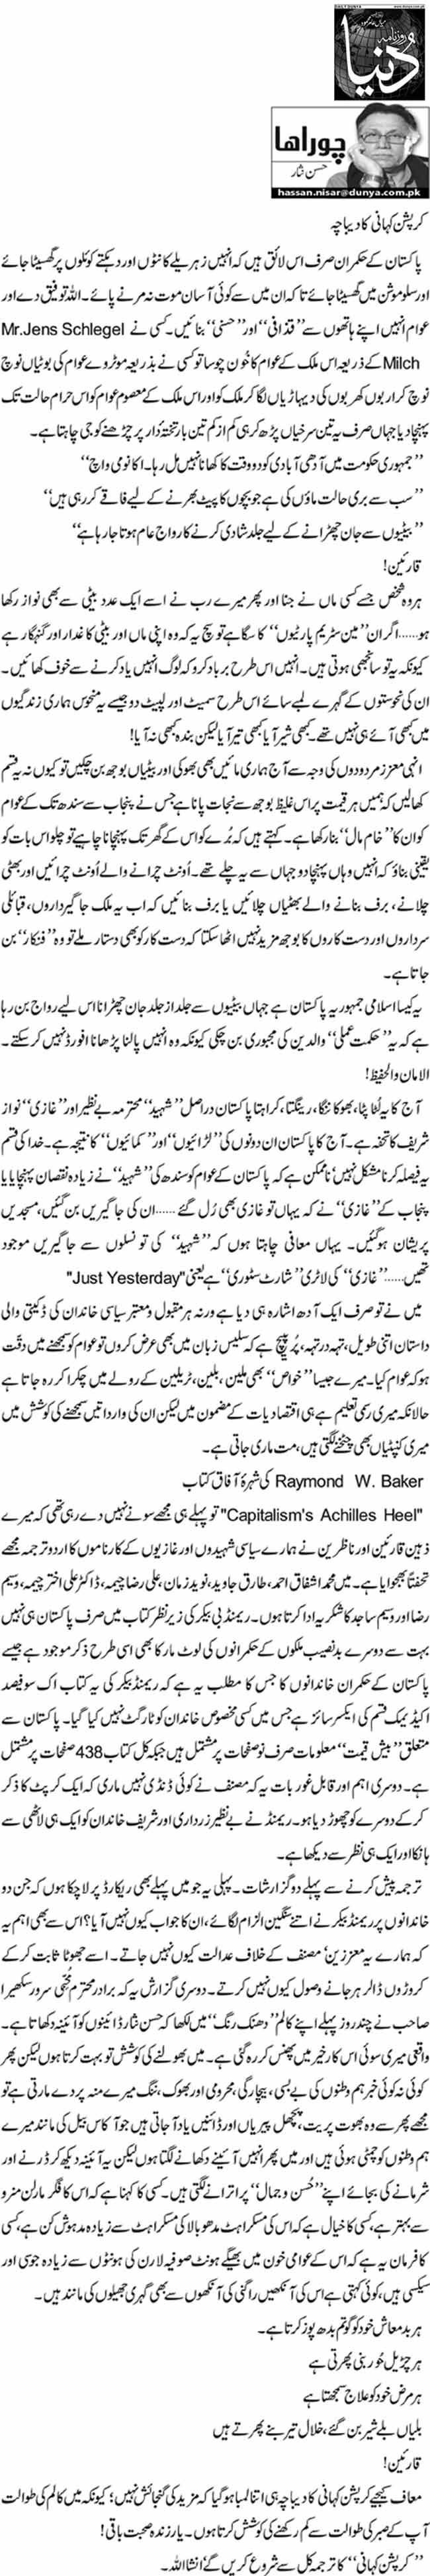 Corruption kahani ka dibachah - Hasan Nisar